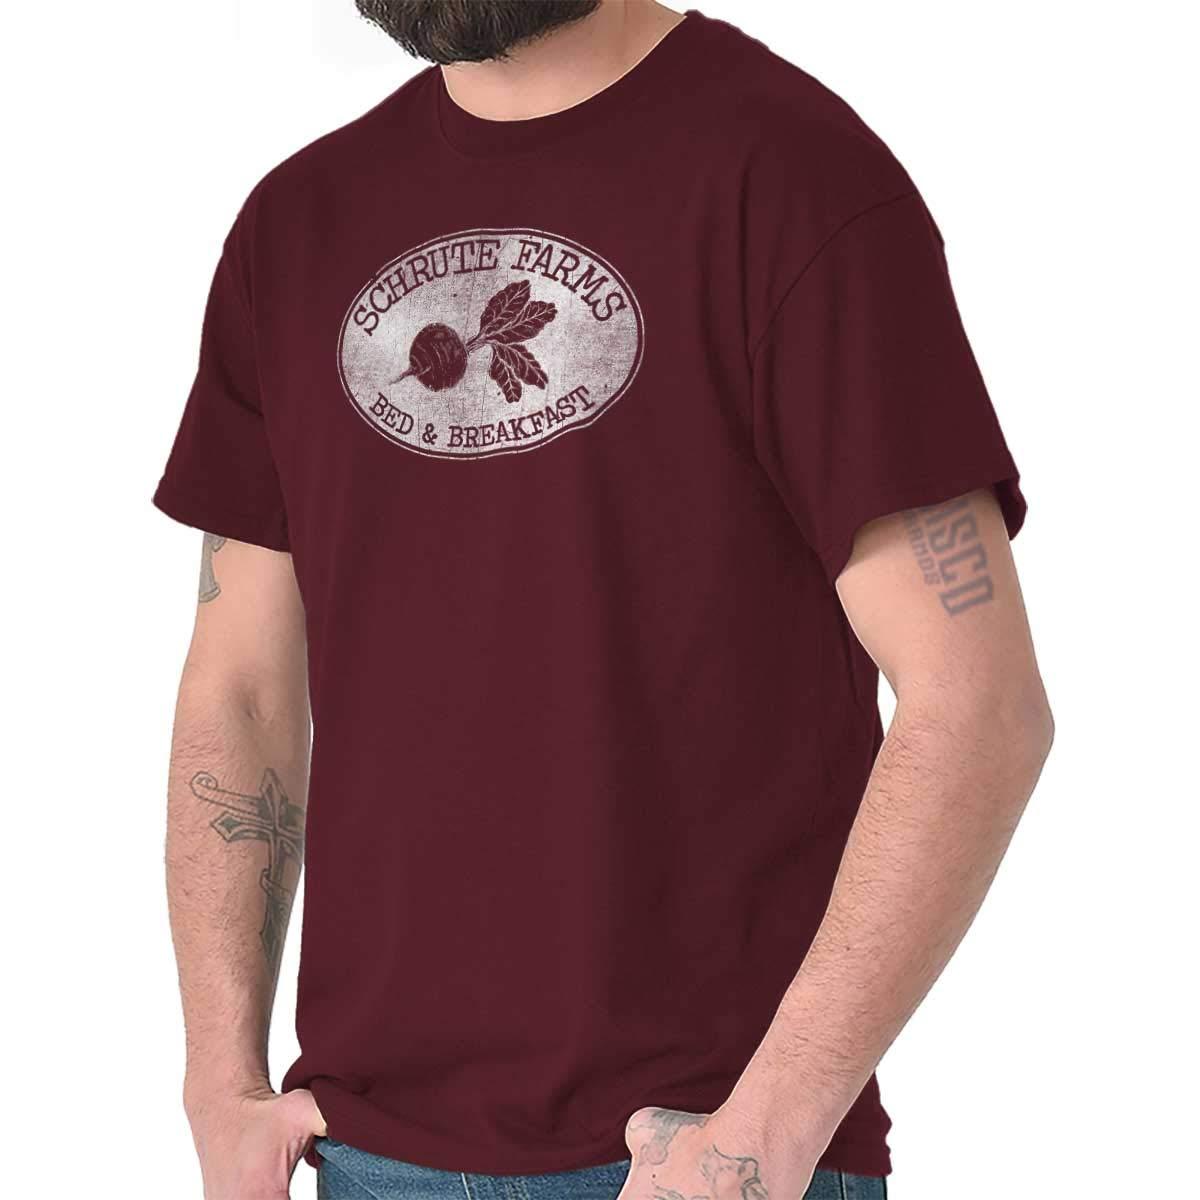 Dwight Schrute Farms Beets B&B Funny Gift Cool Cute Jim Pam T-Shirt Tee